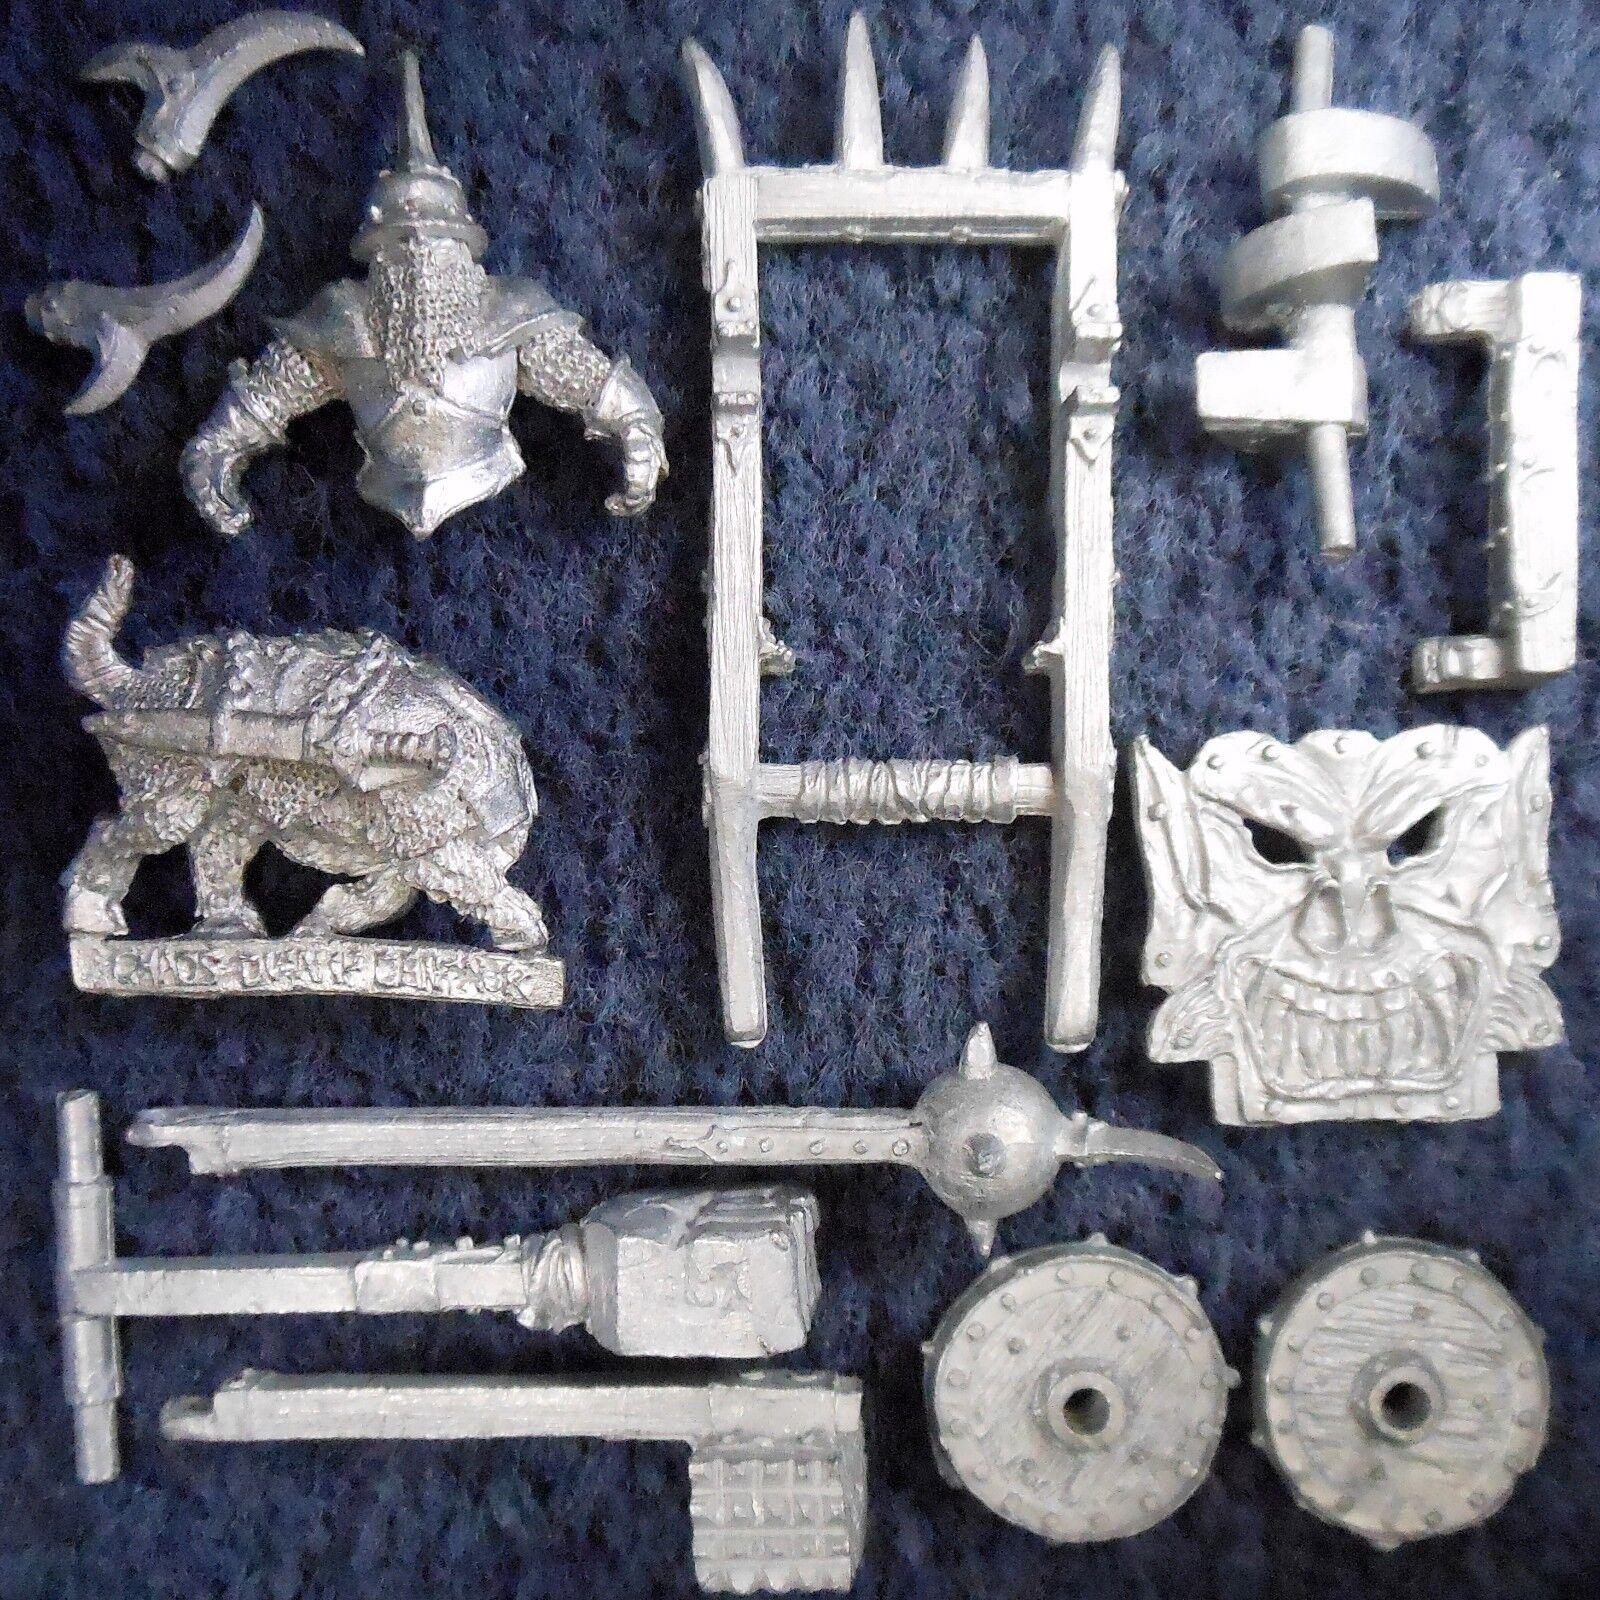 1987 caos enano Ablandador ciudadela 0205 CH3 Máquina de Guerra Warhammer army Hordas